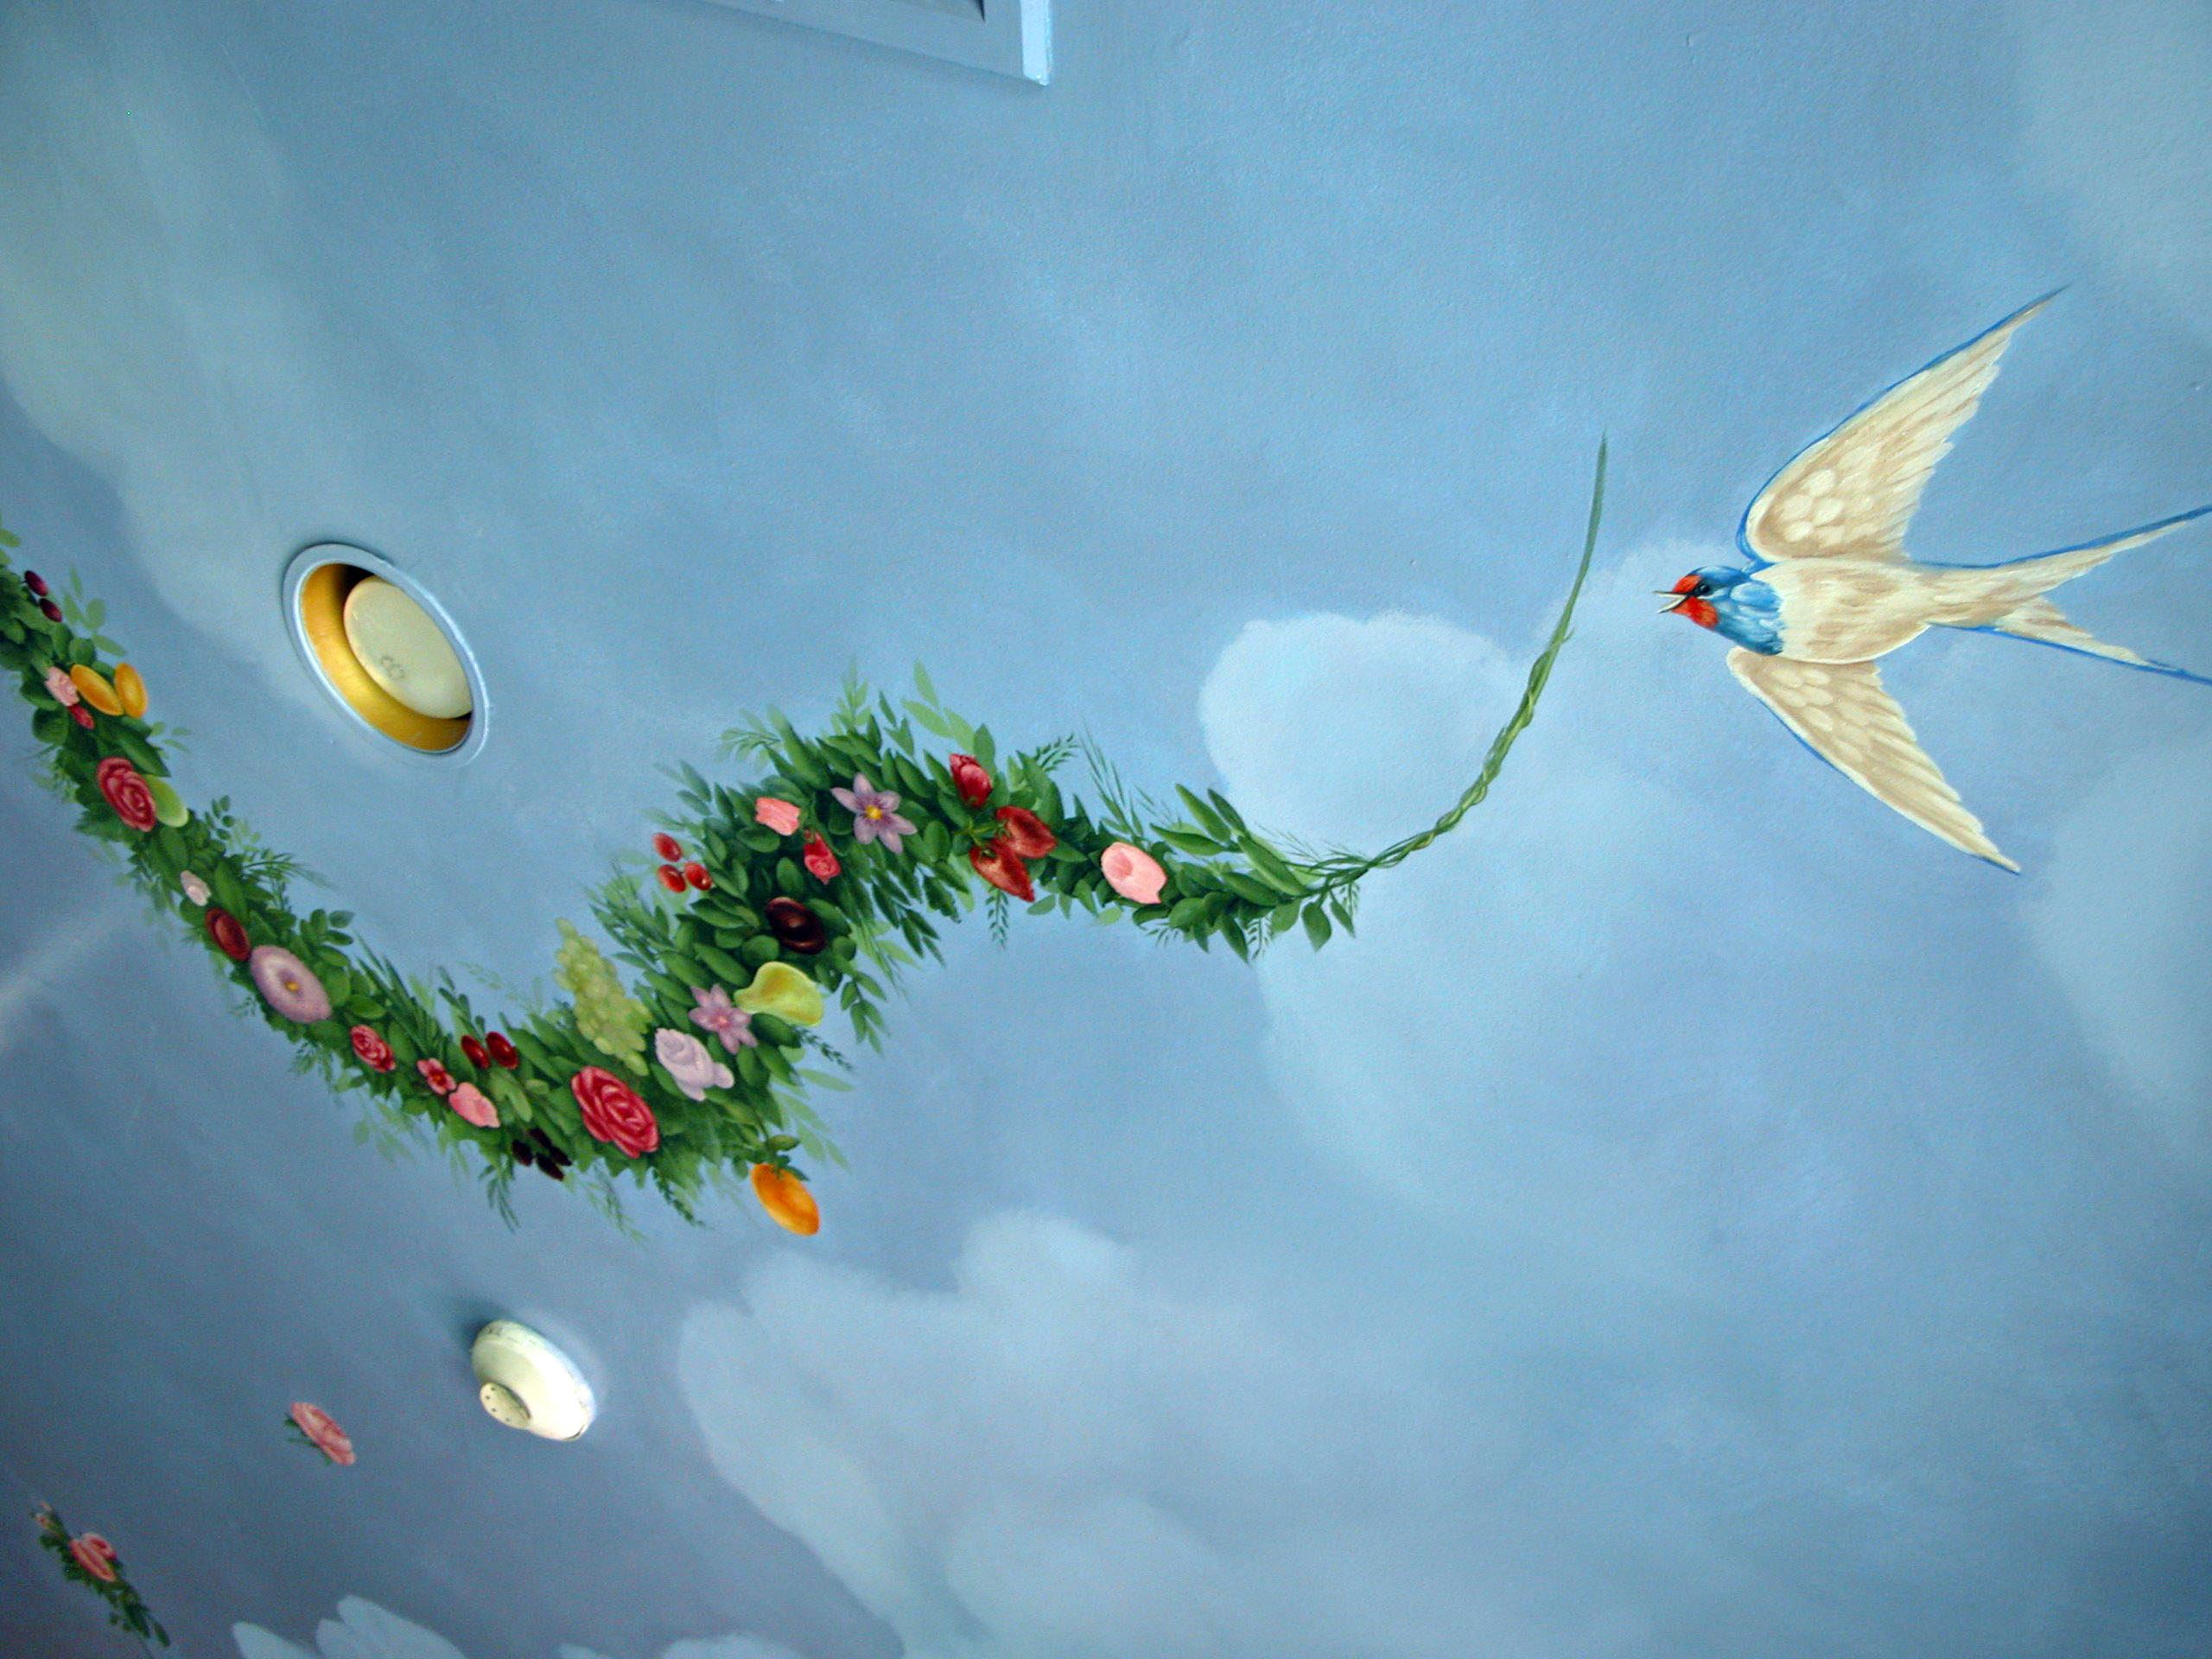 Ceiling Mural Idea Rumson NJ